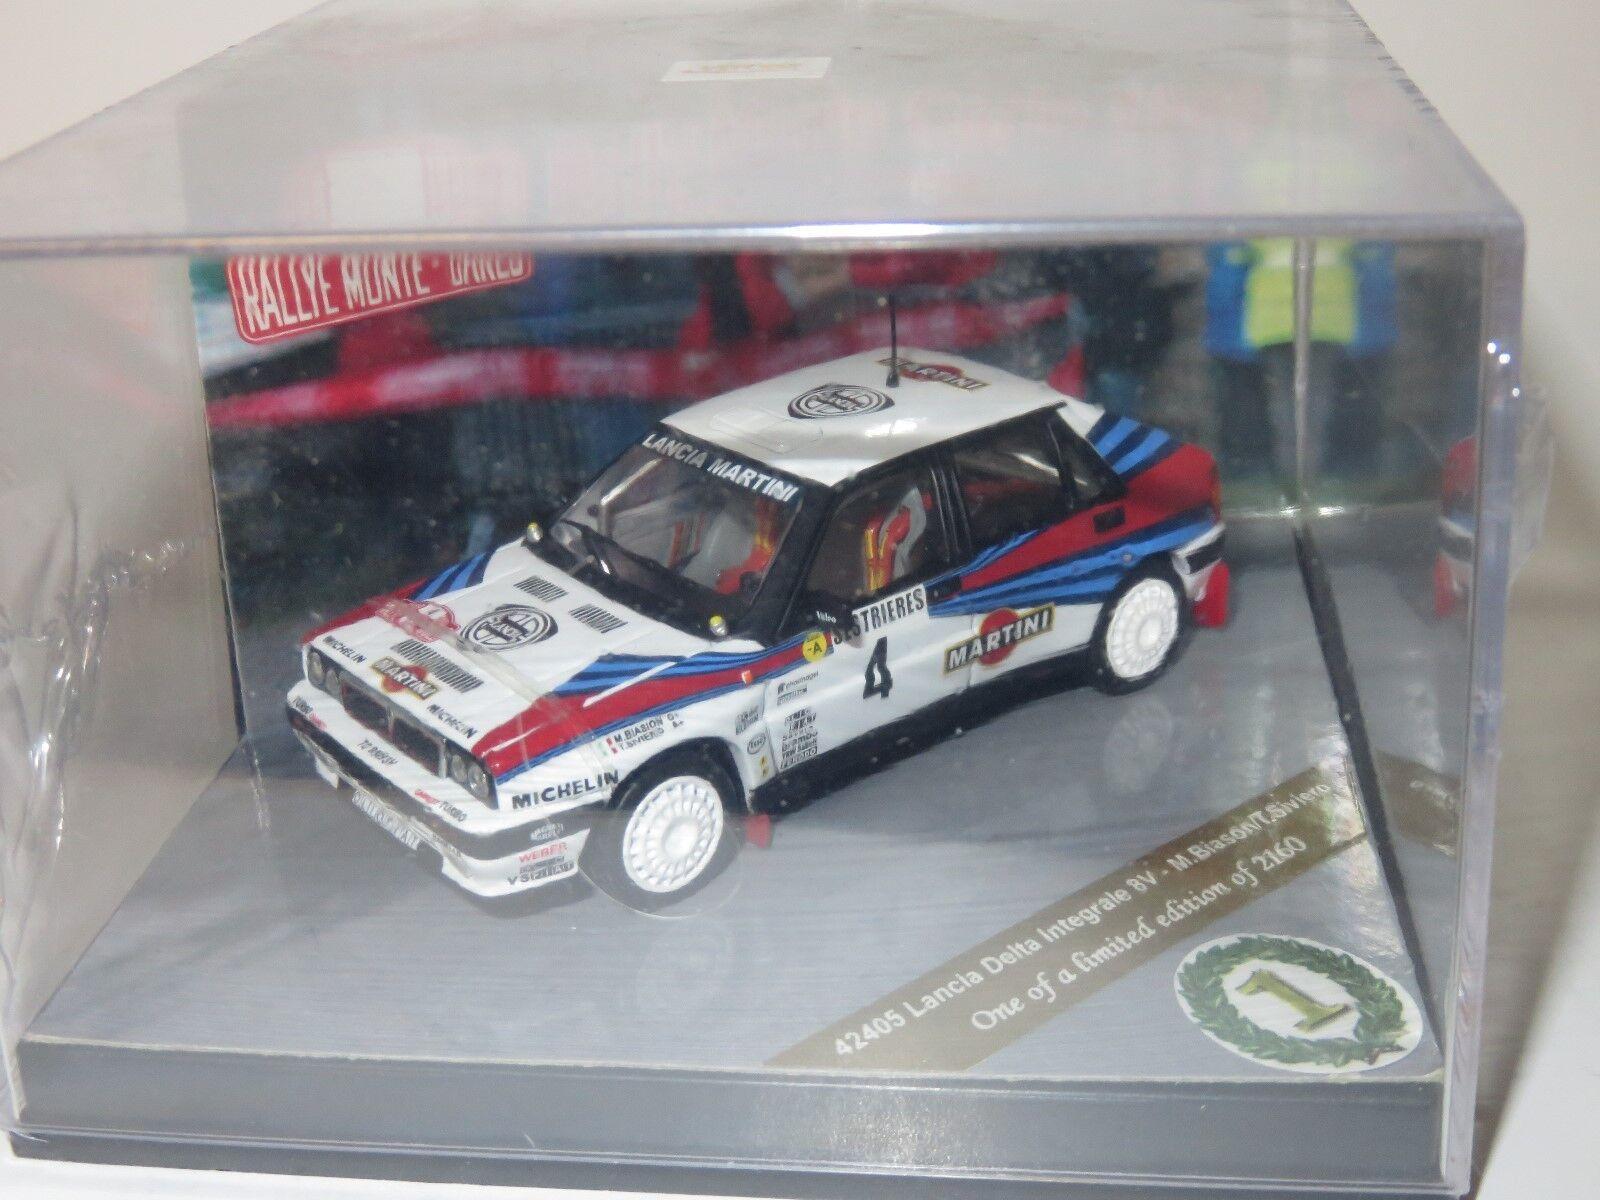 1/43 Lancia Delta Integrale 8 V Martini winner winner winner Rallye Monte Carlo 1989 M. Biasion | Qualité Fine  b37109